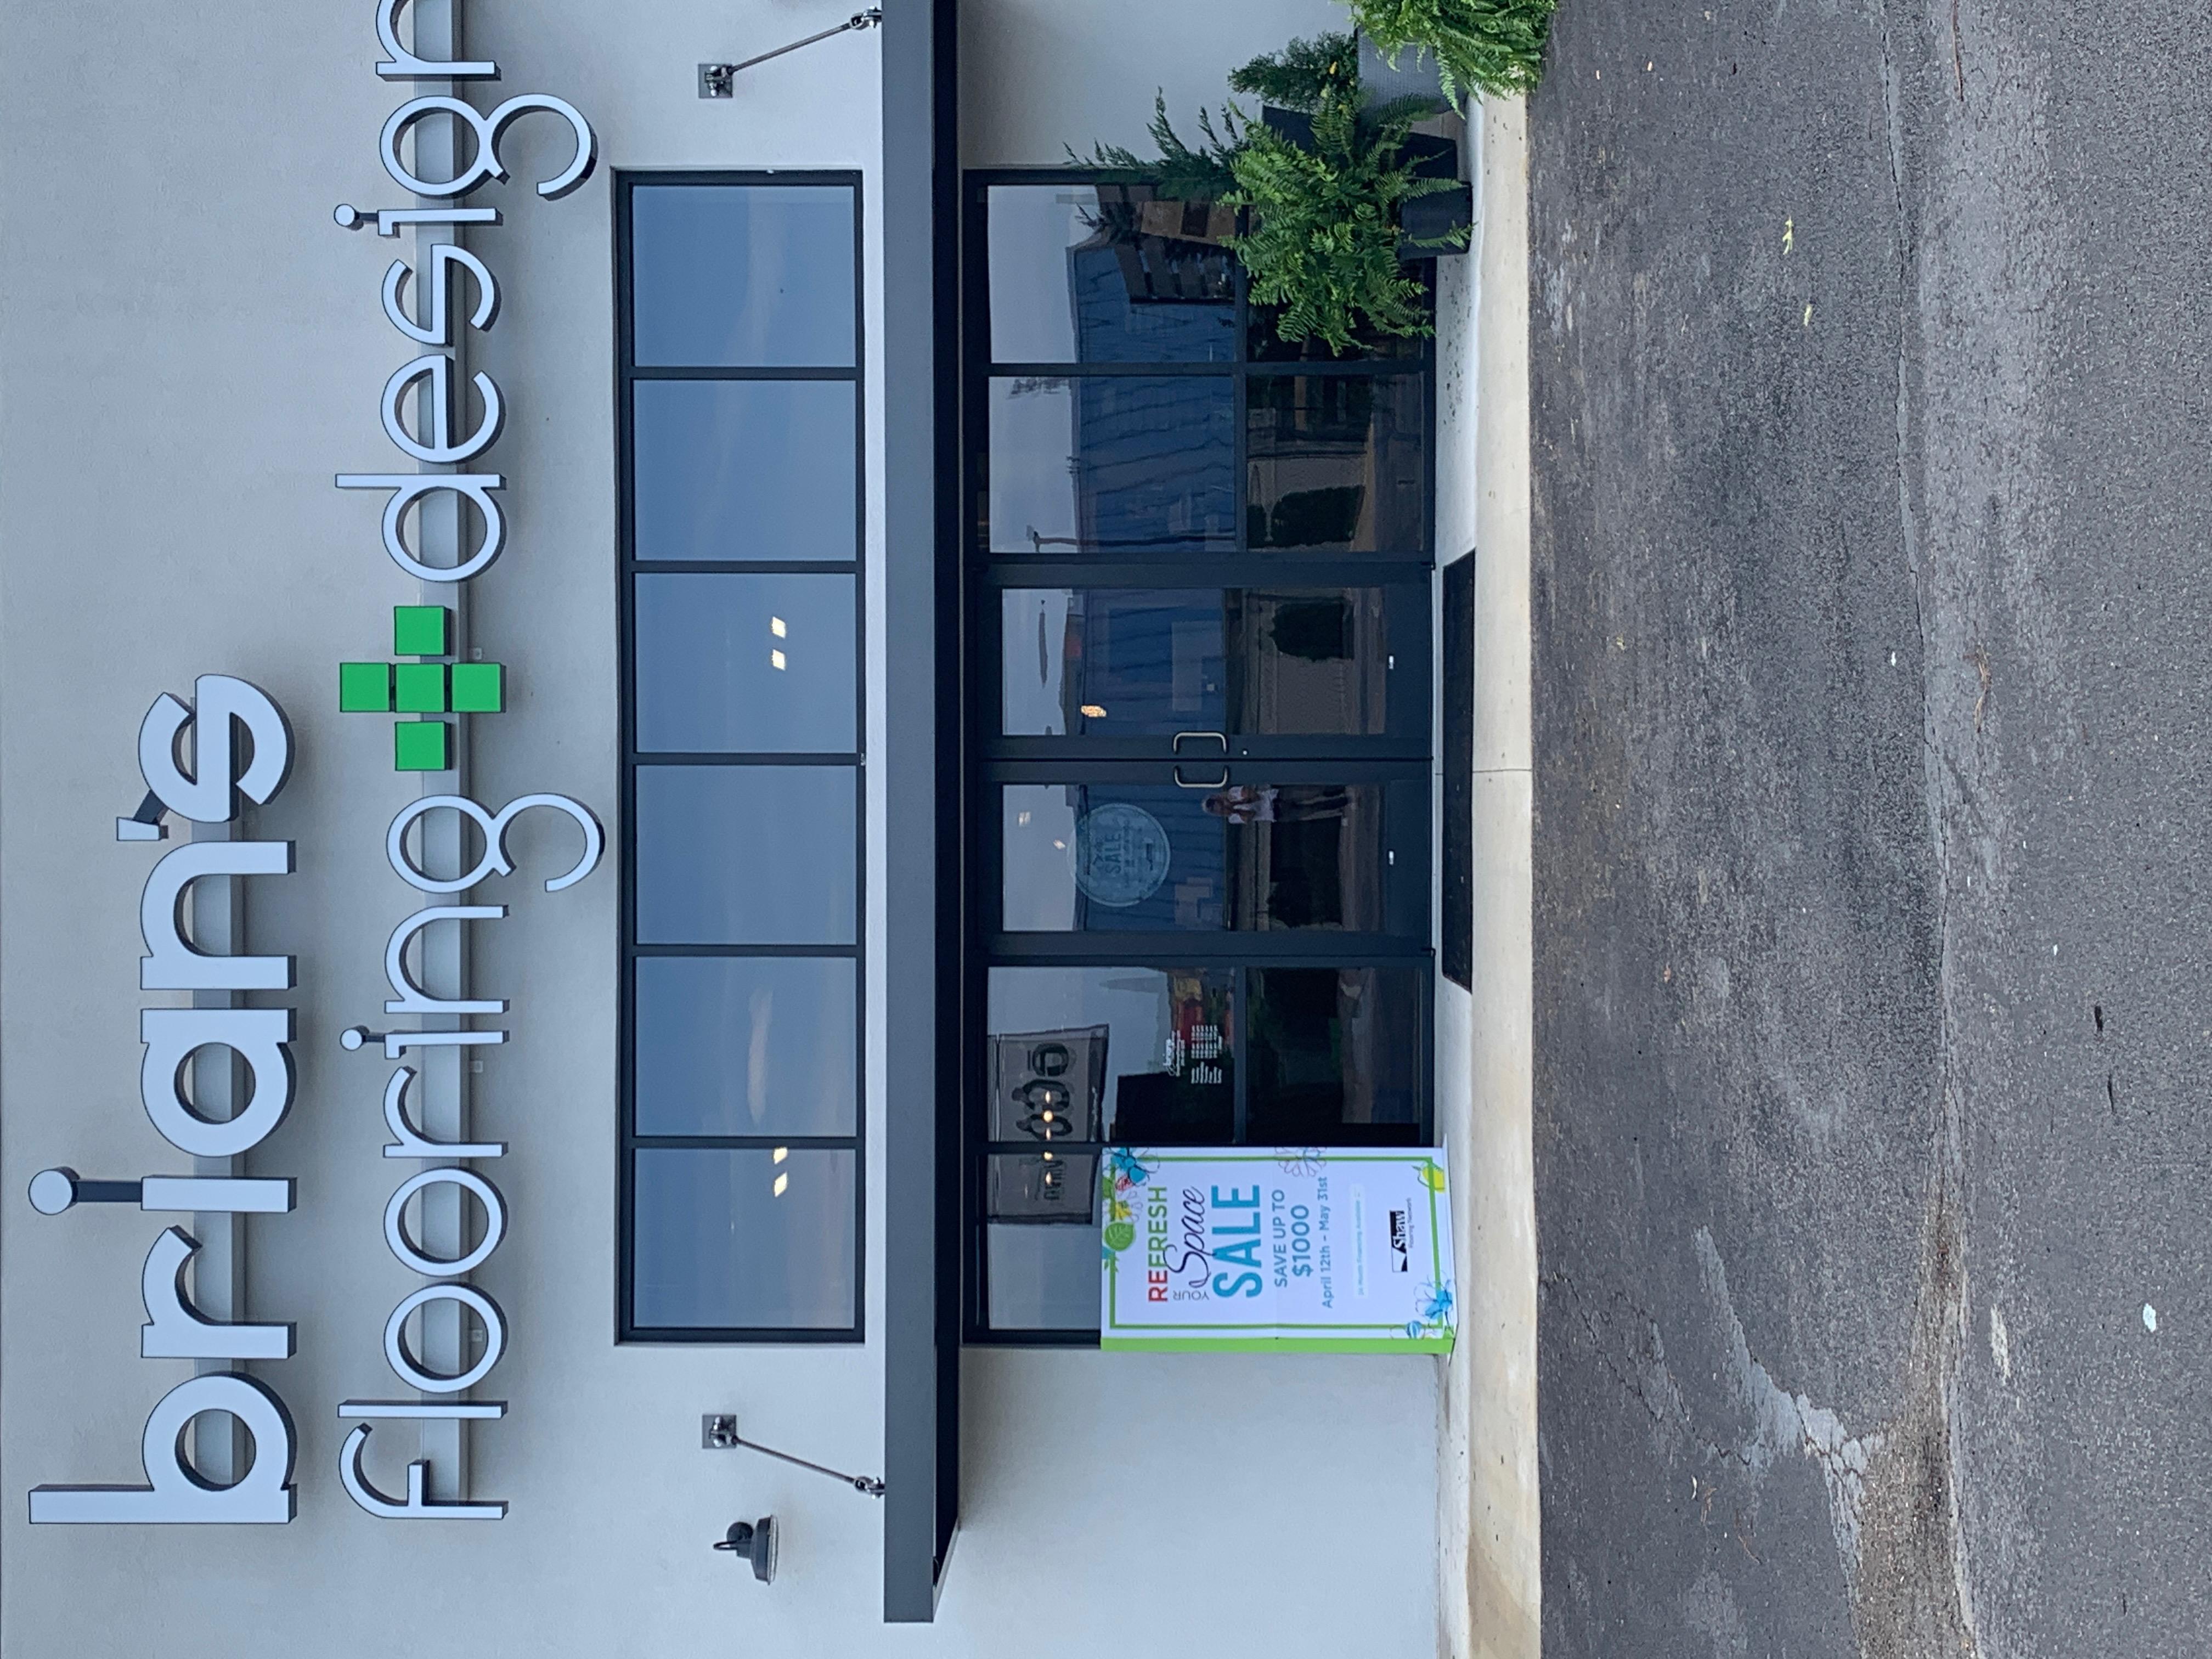 Brian's Flooring & Design - 4817 McAdory School Rd, McCalla, AL 35111